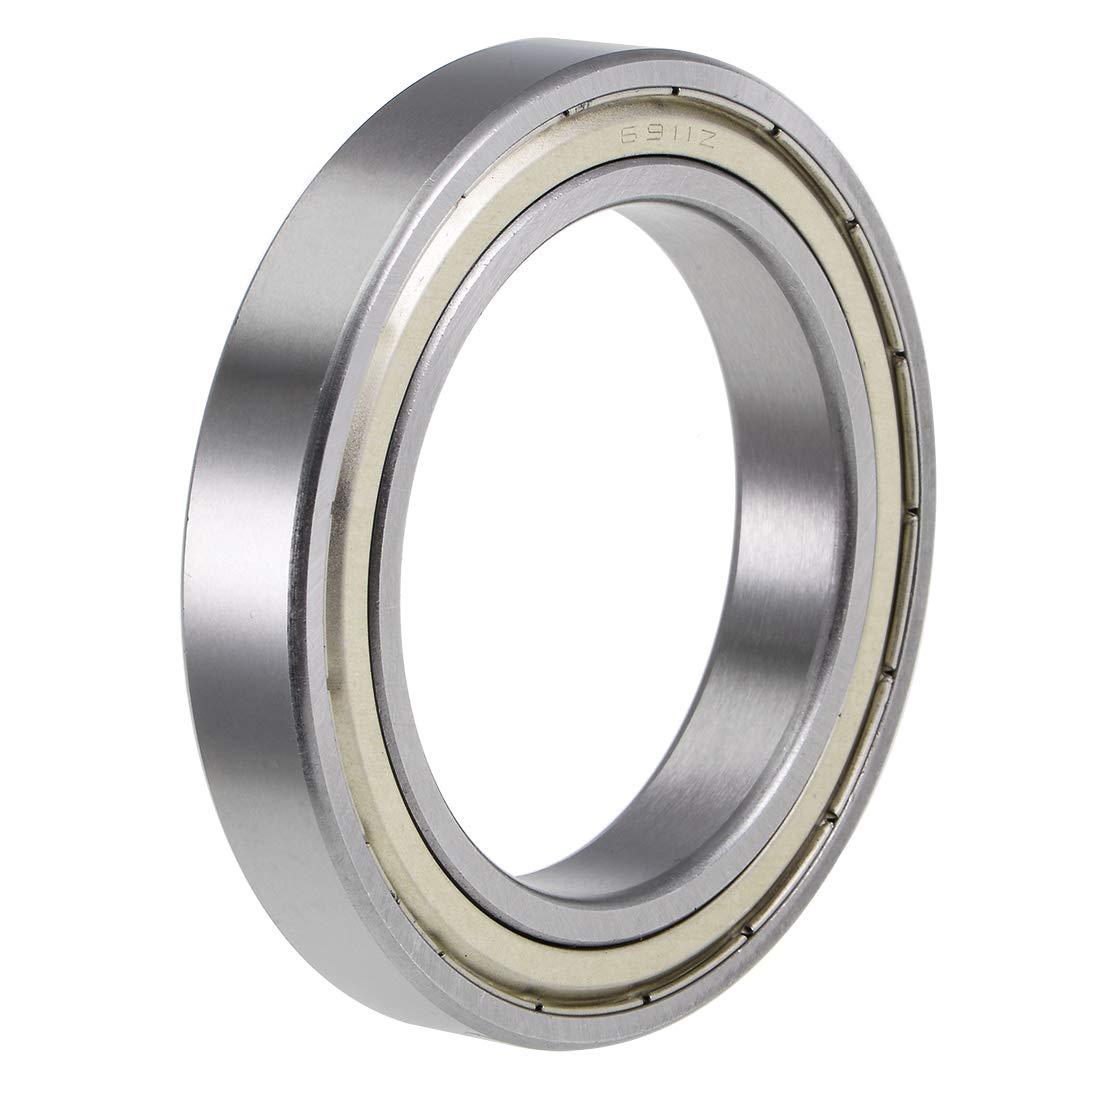 uxcell 6911ZZ Deep Groove Ball Bearings Z2 55mm x 80mm x 13mm Double Shielded Chrome Steel